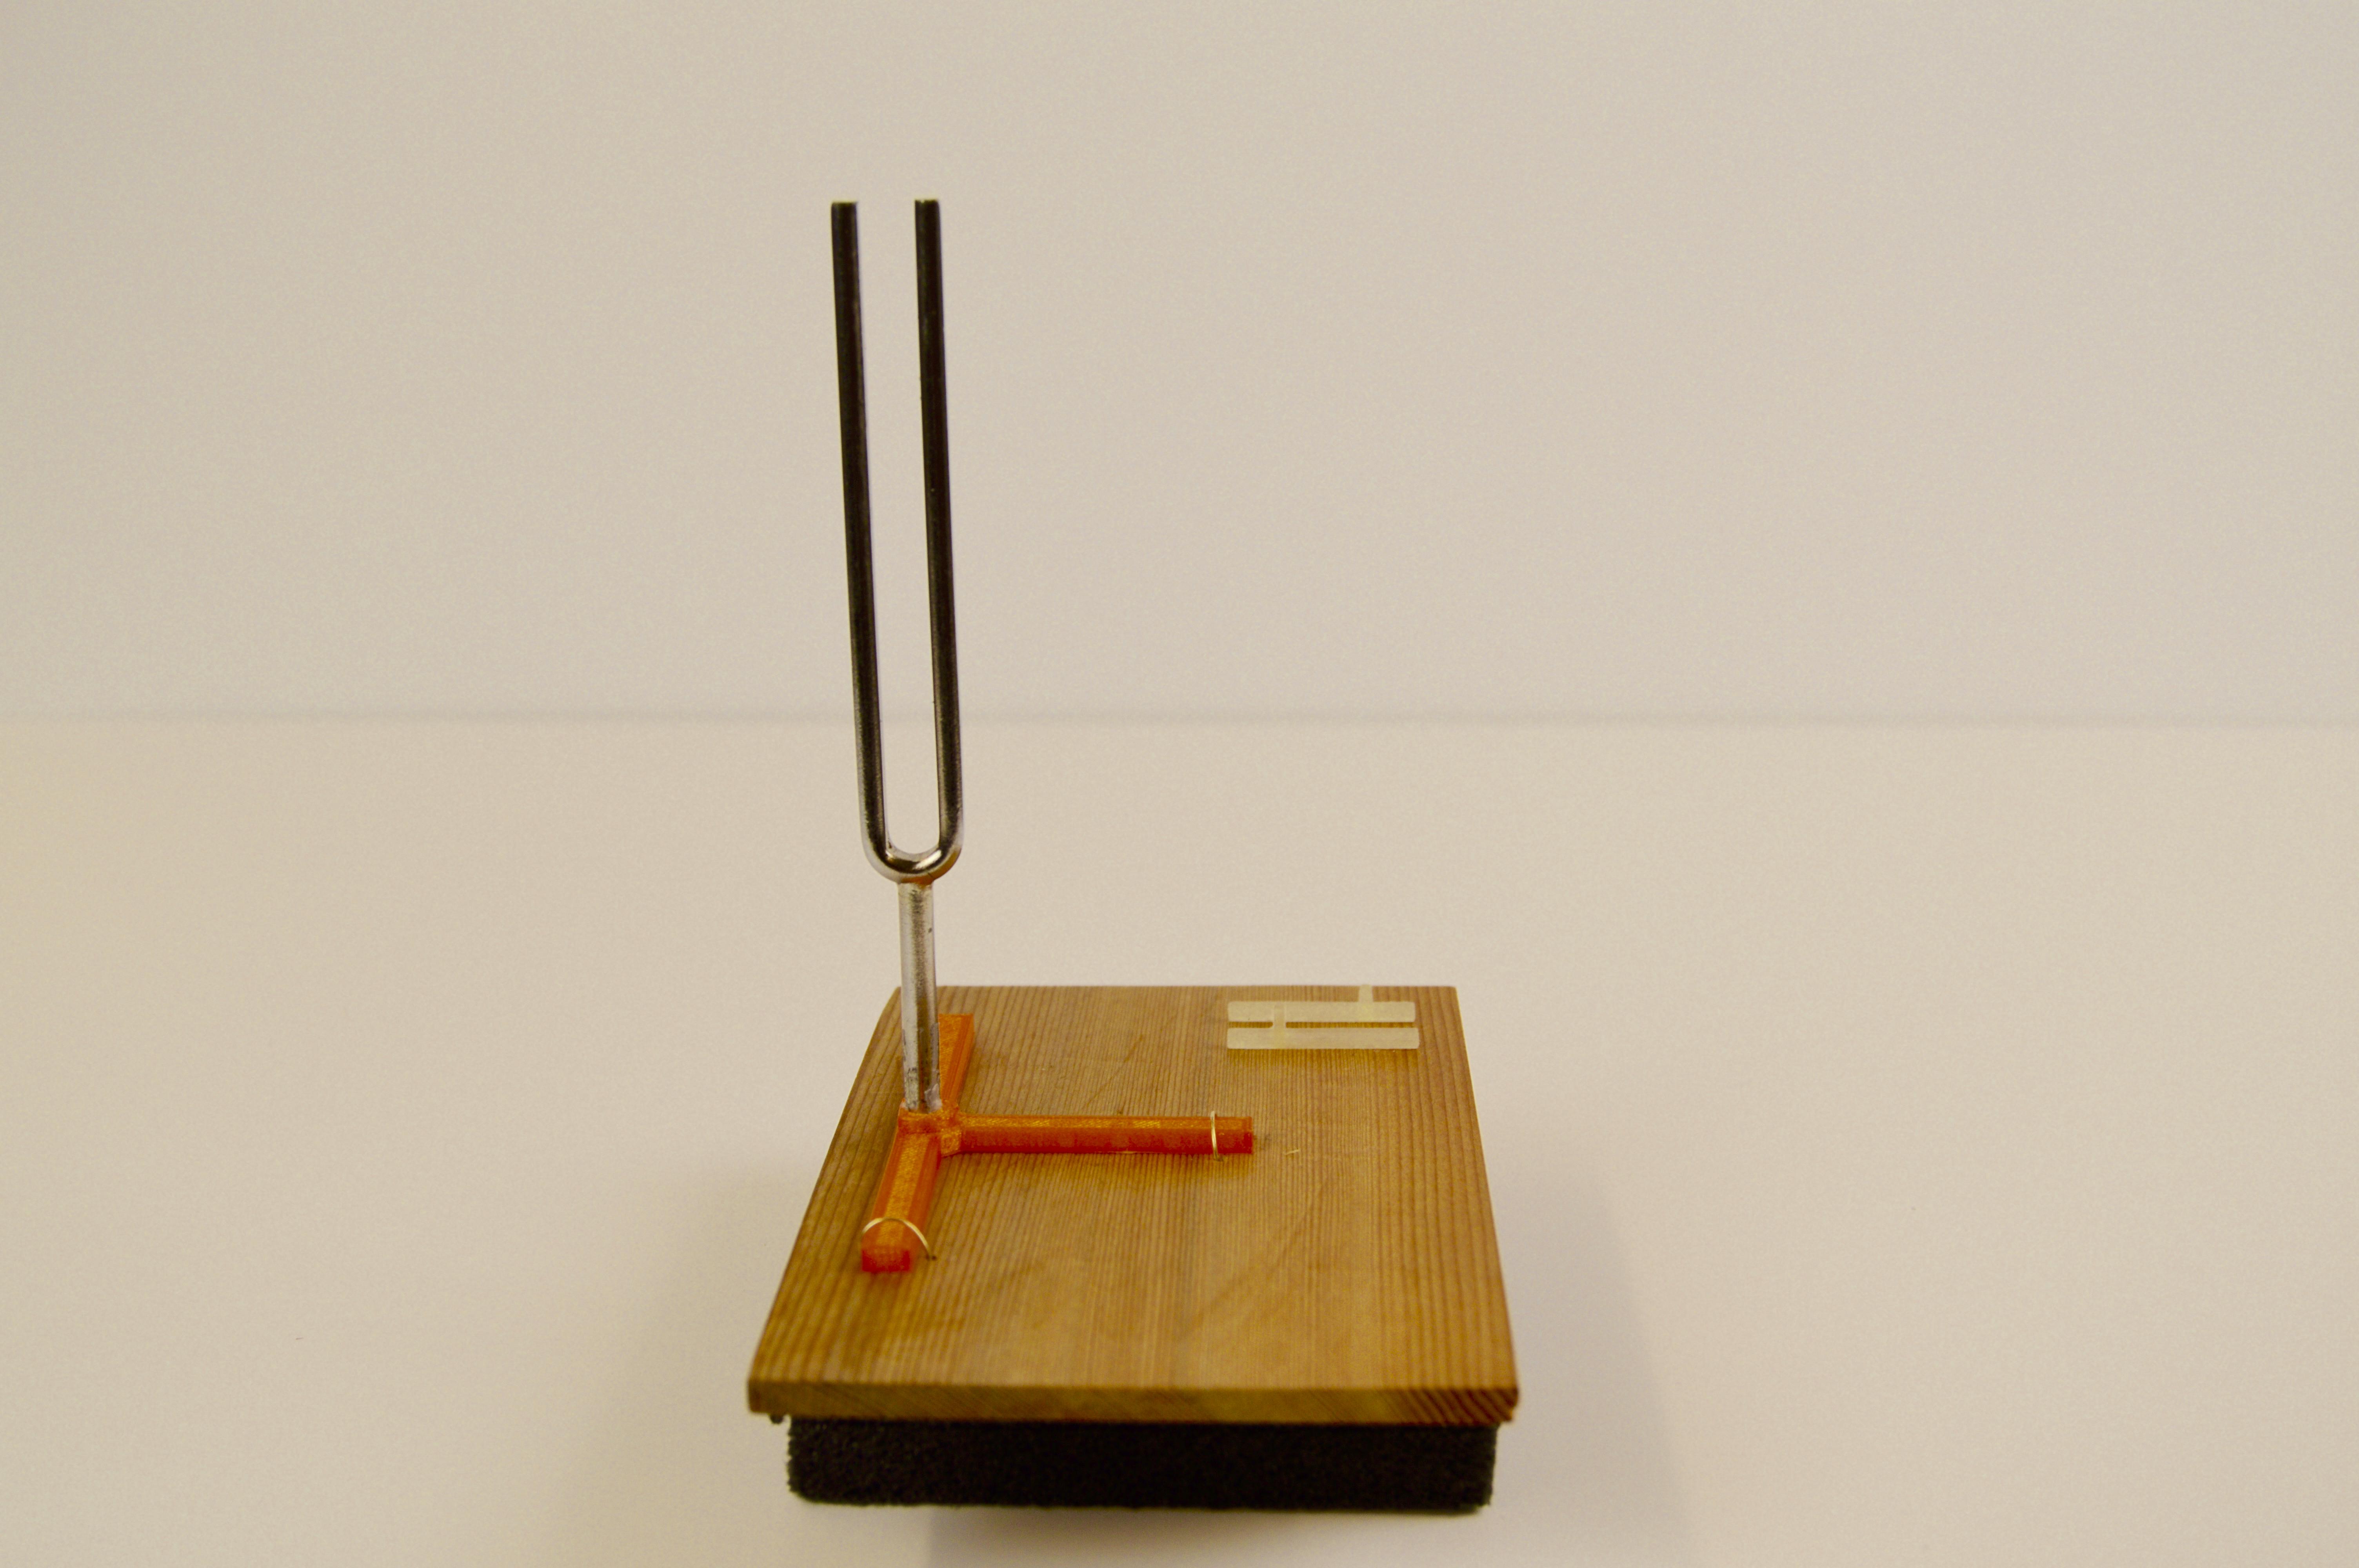 Sidband - soundboard